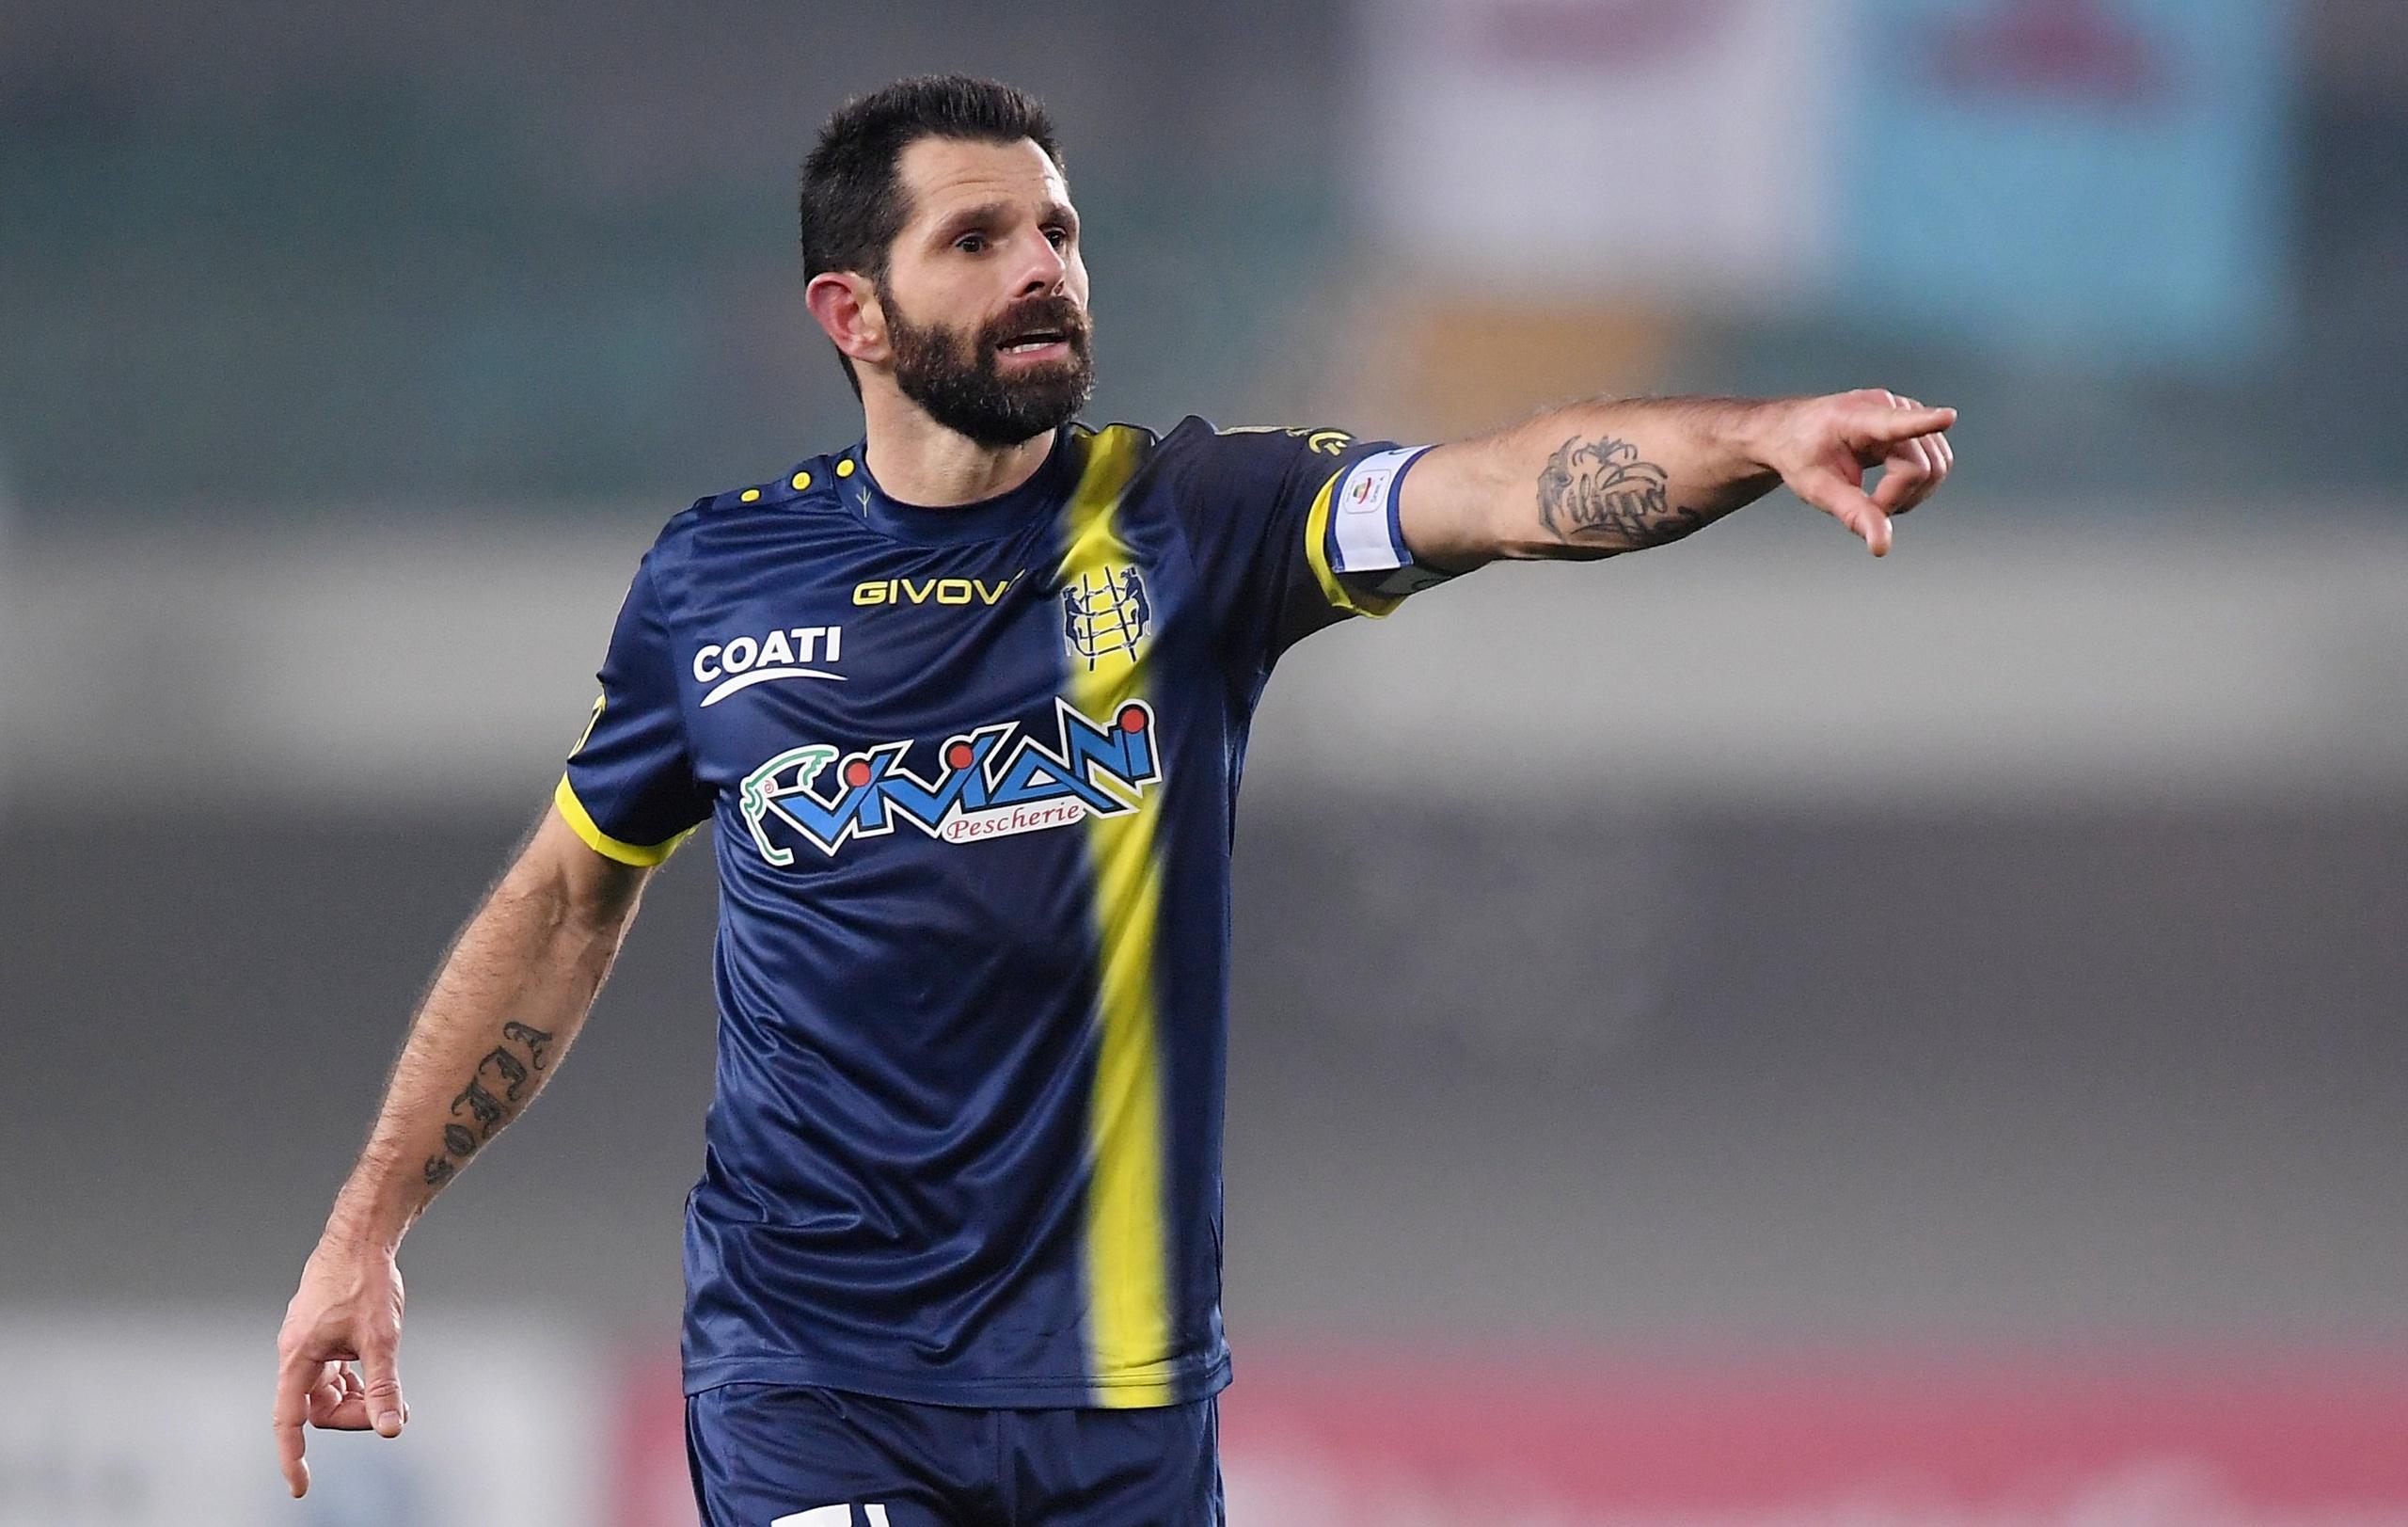 Italienska Chievo i konkurs